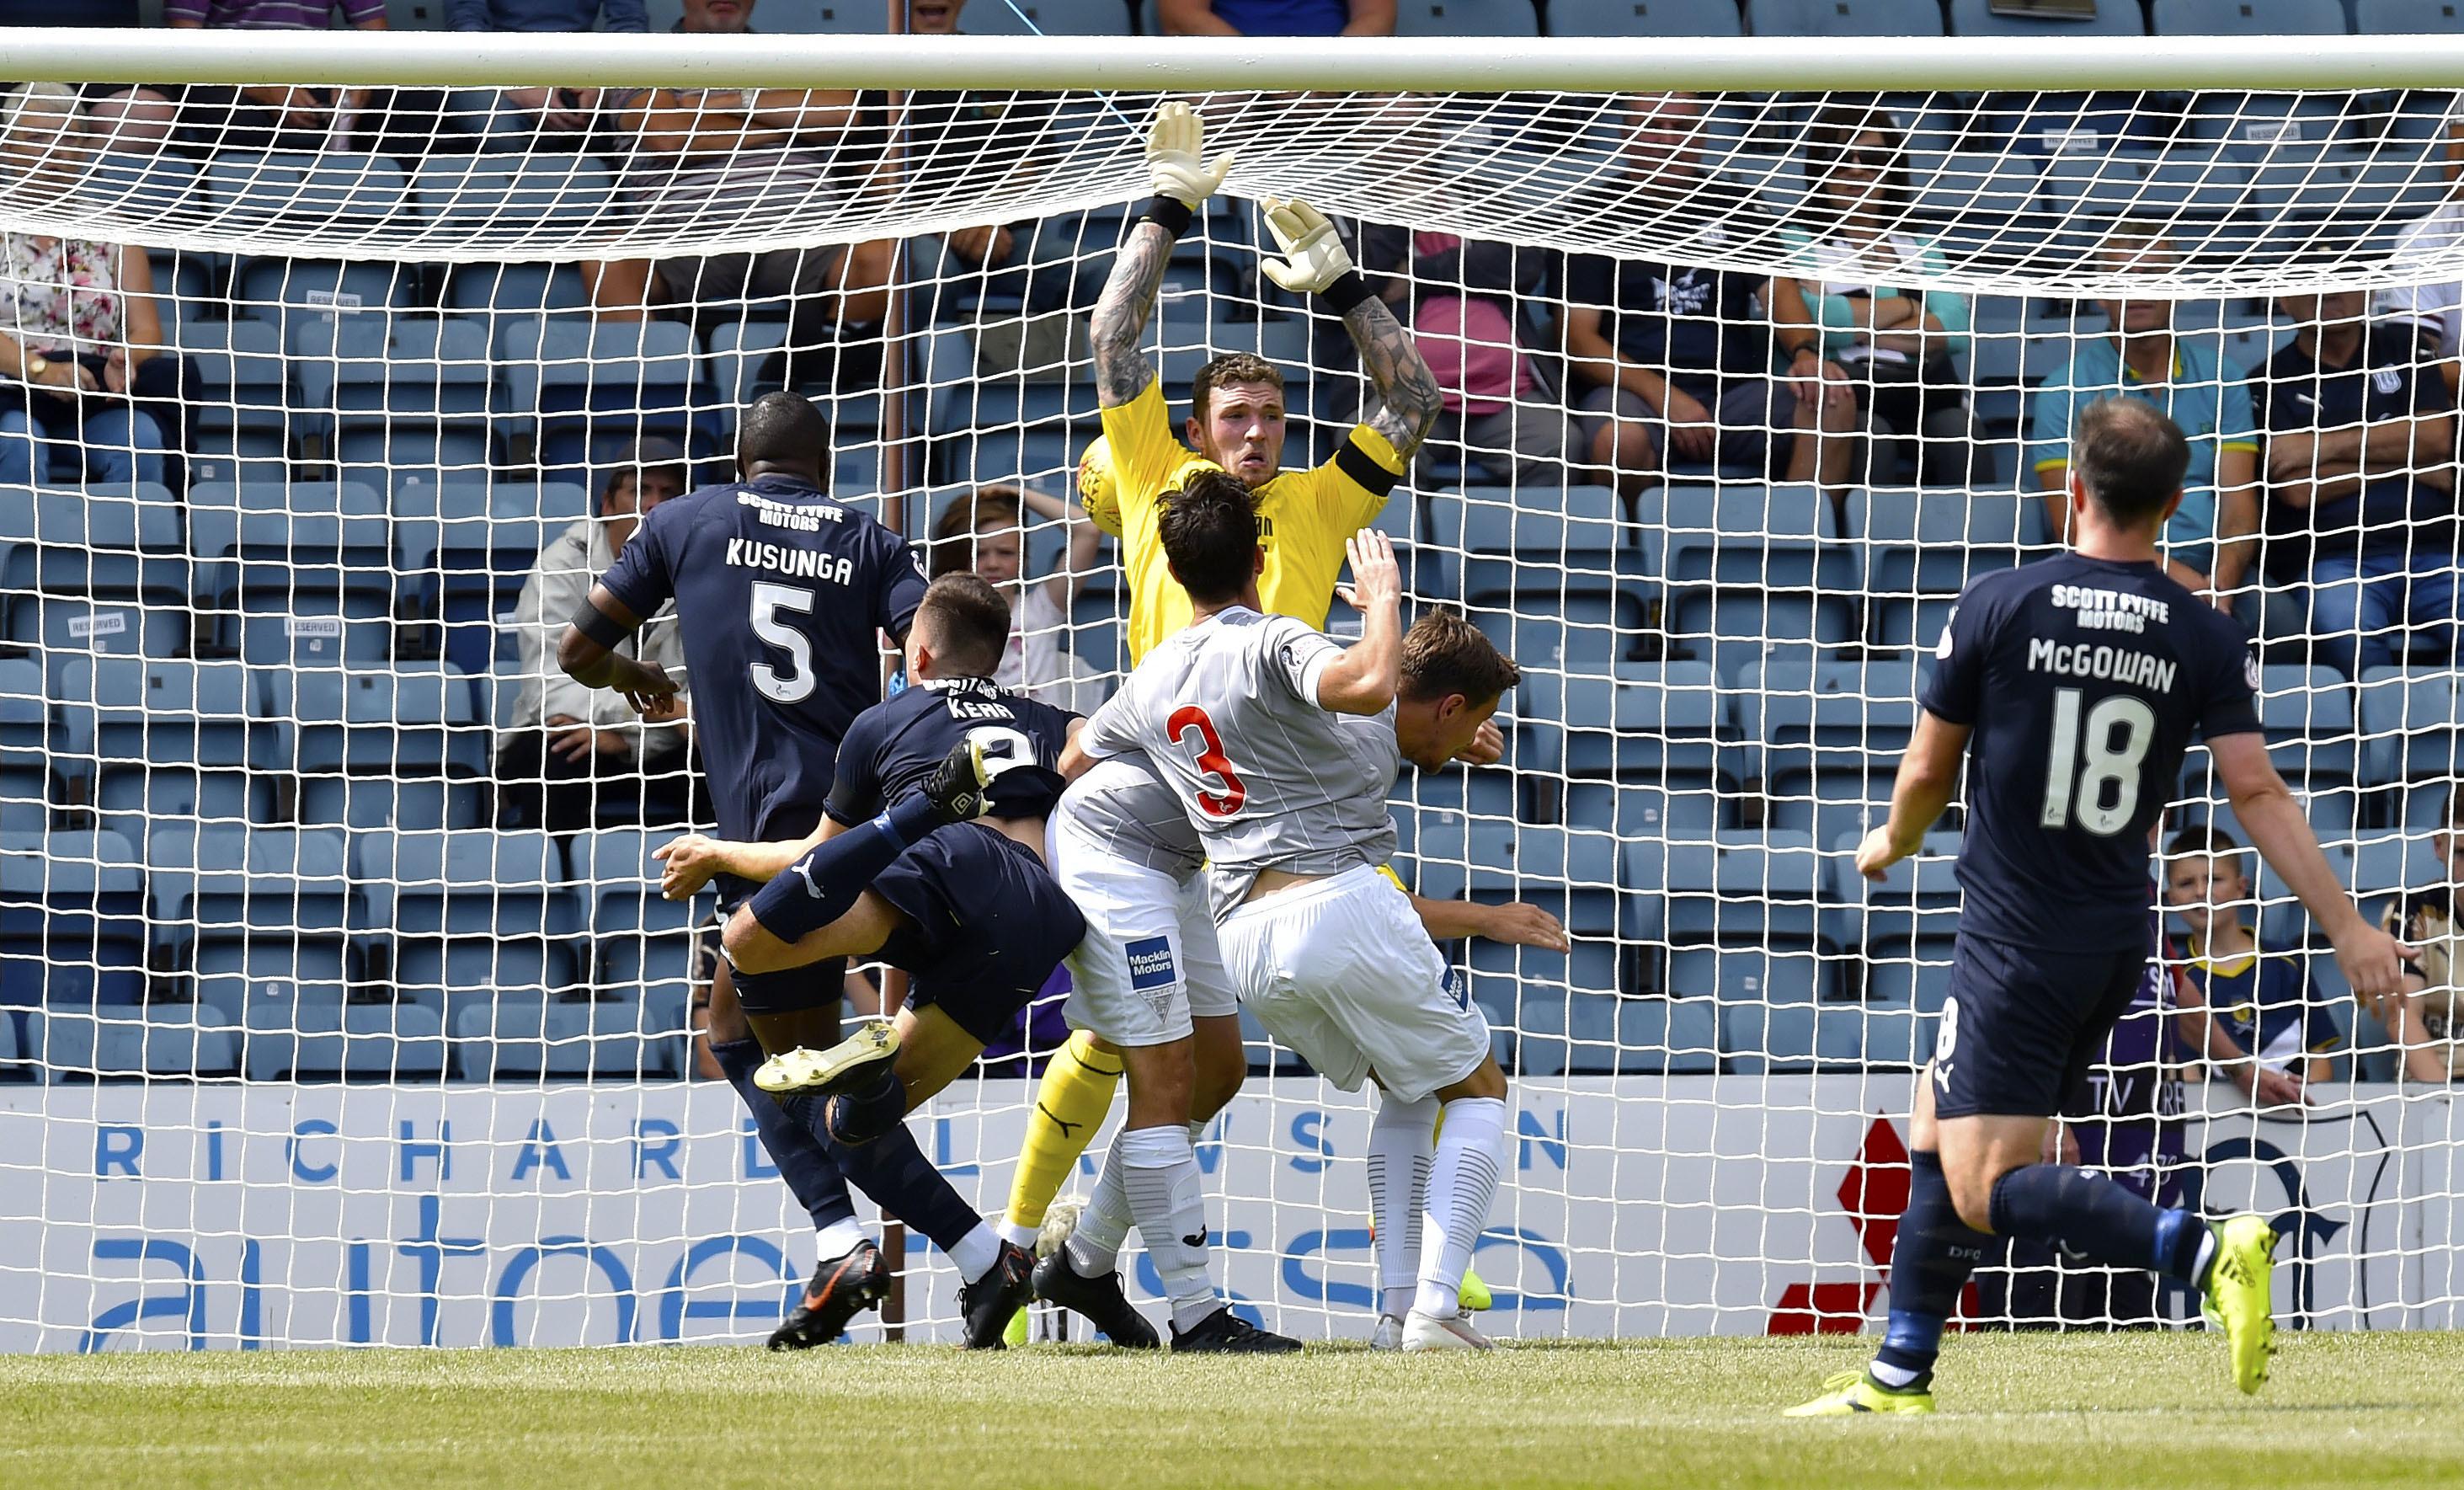 Jackson Longridge scores to make it 1-0 Dunfermline.